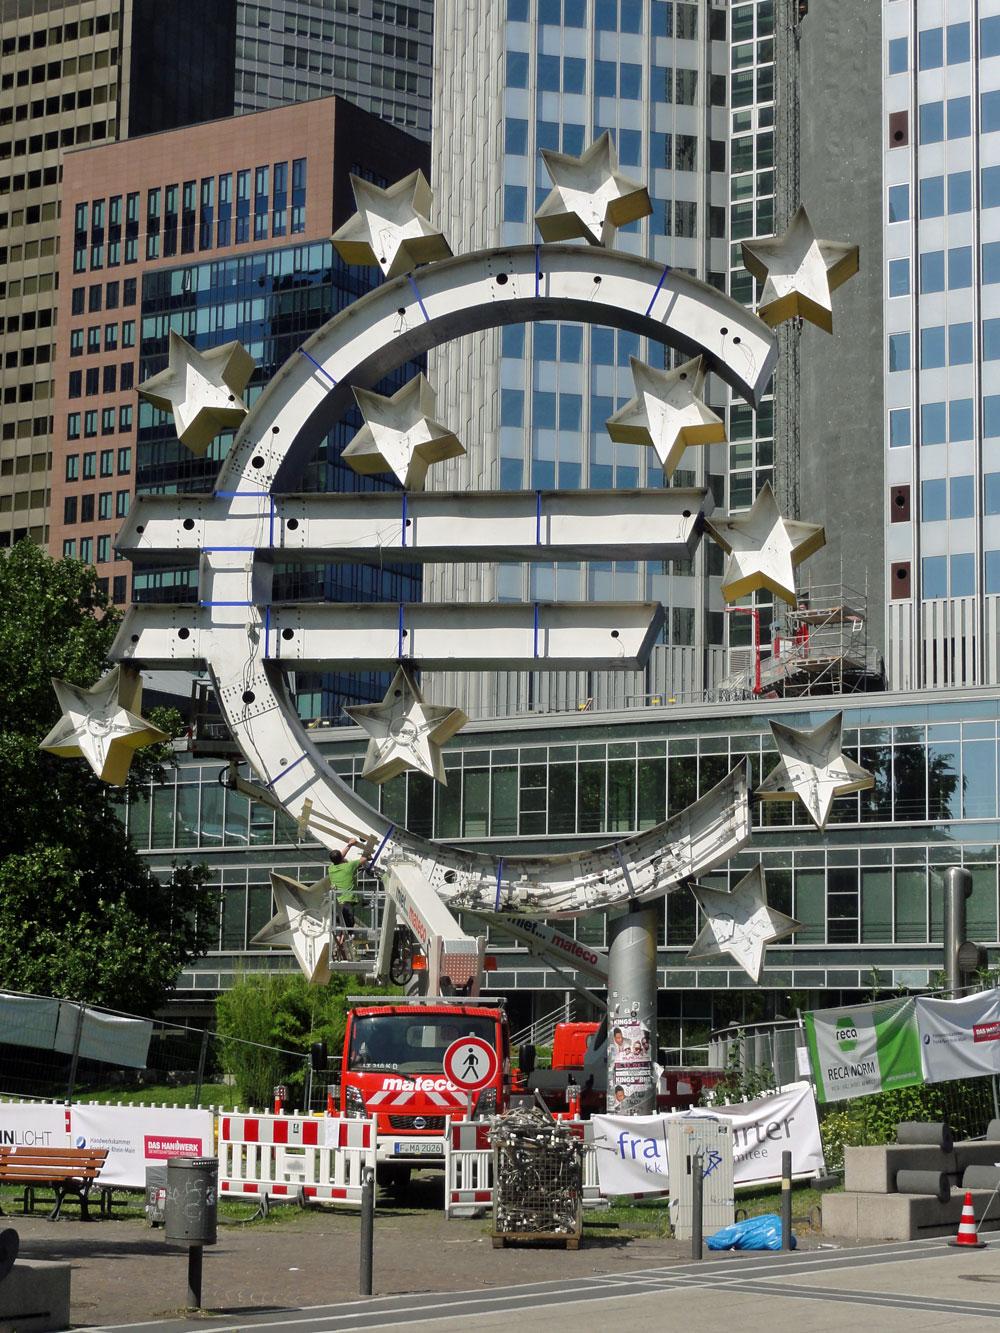 EURO SKULPTUR IN FRANKFURT WIRD RENOVIERT